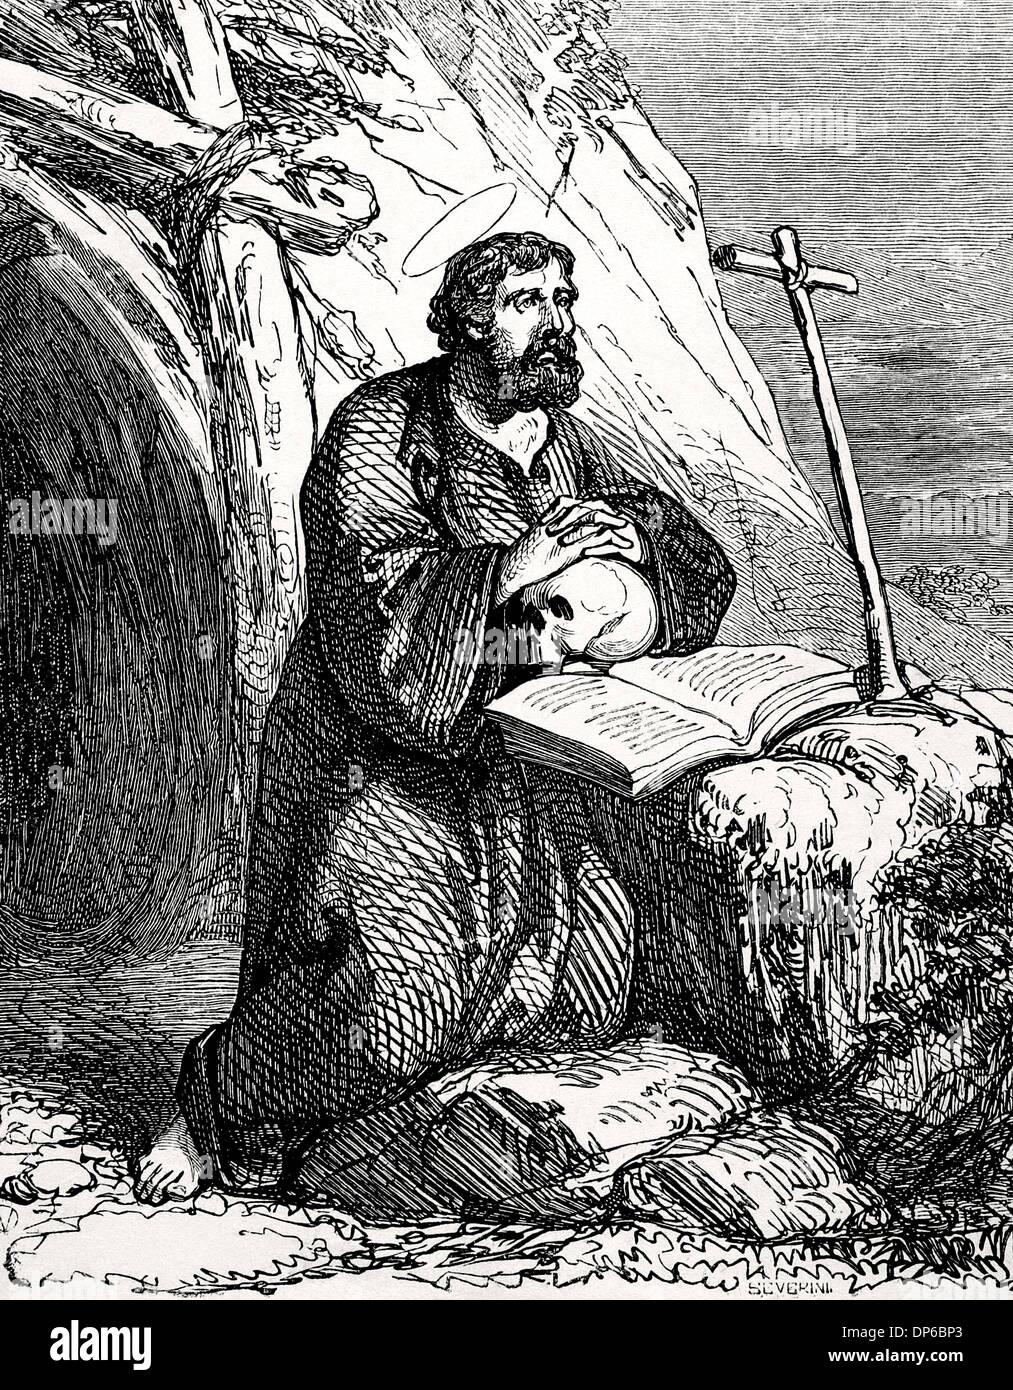 John the Presbyter or John the elder (died 362). Priest and Christian martyr. Engraving Severini. 'Ano Cristiano,' 1852. - Stock Image